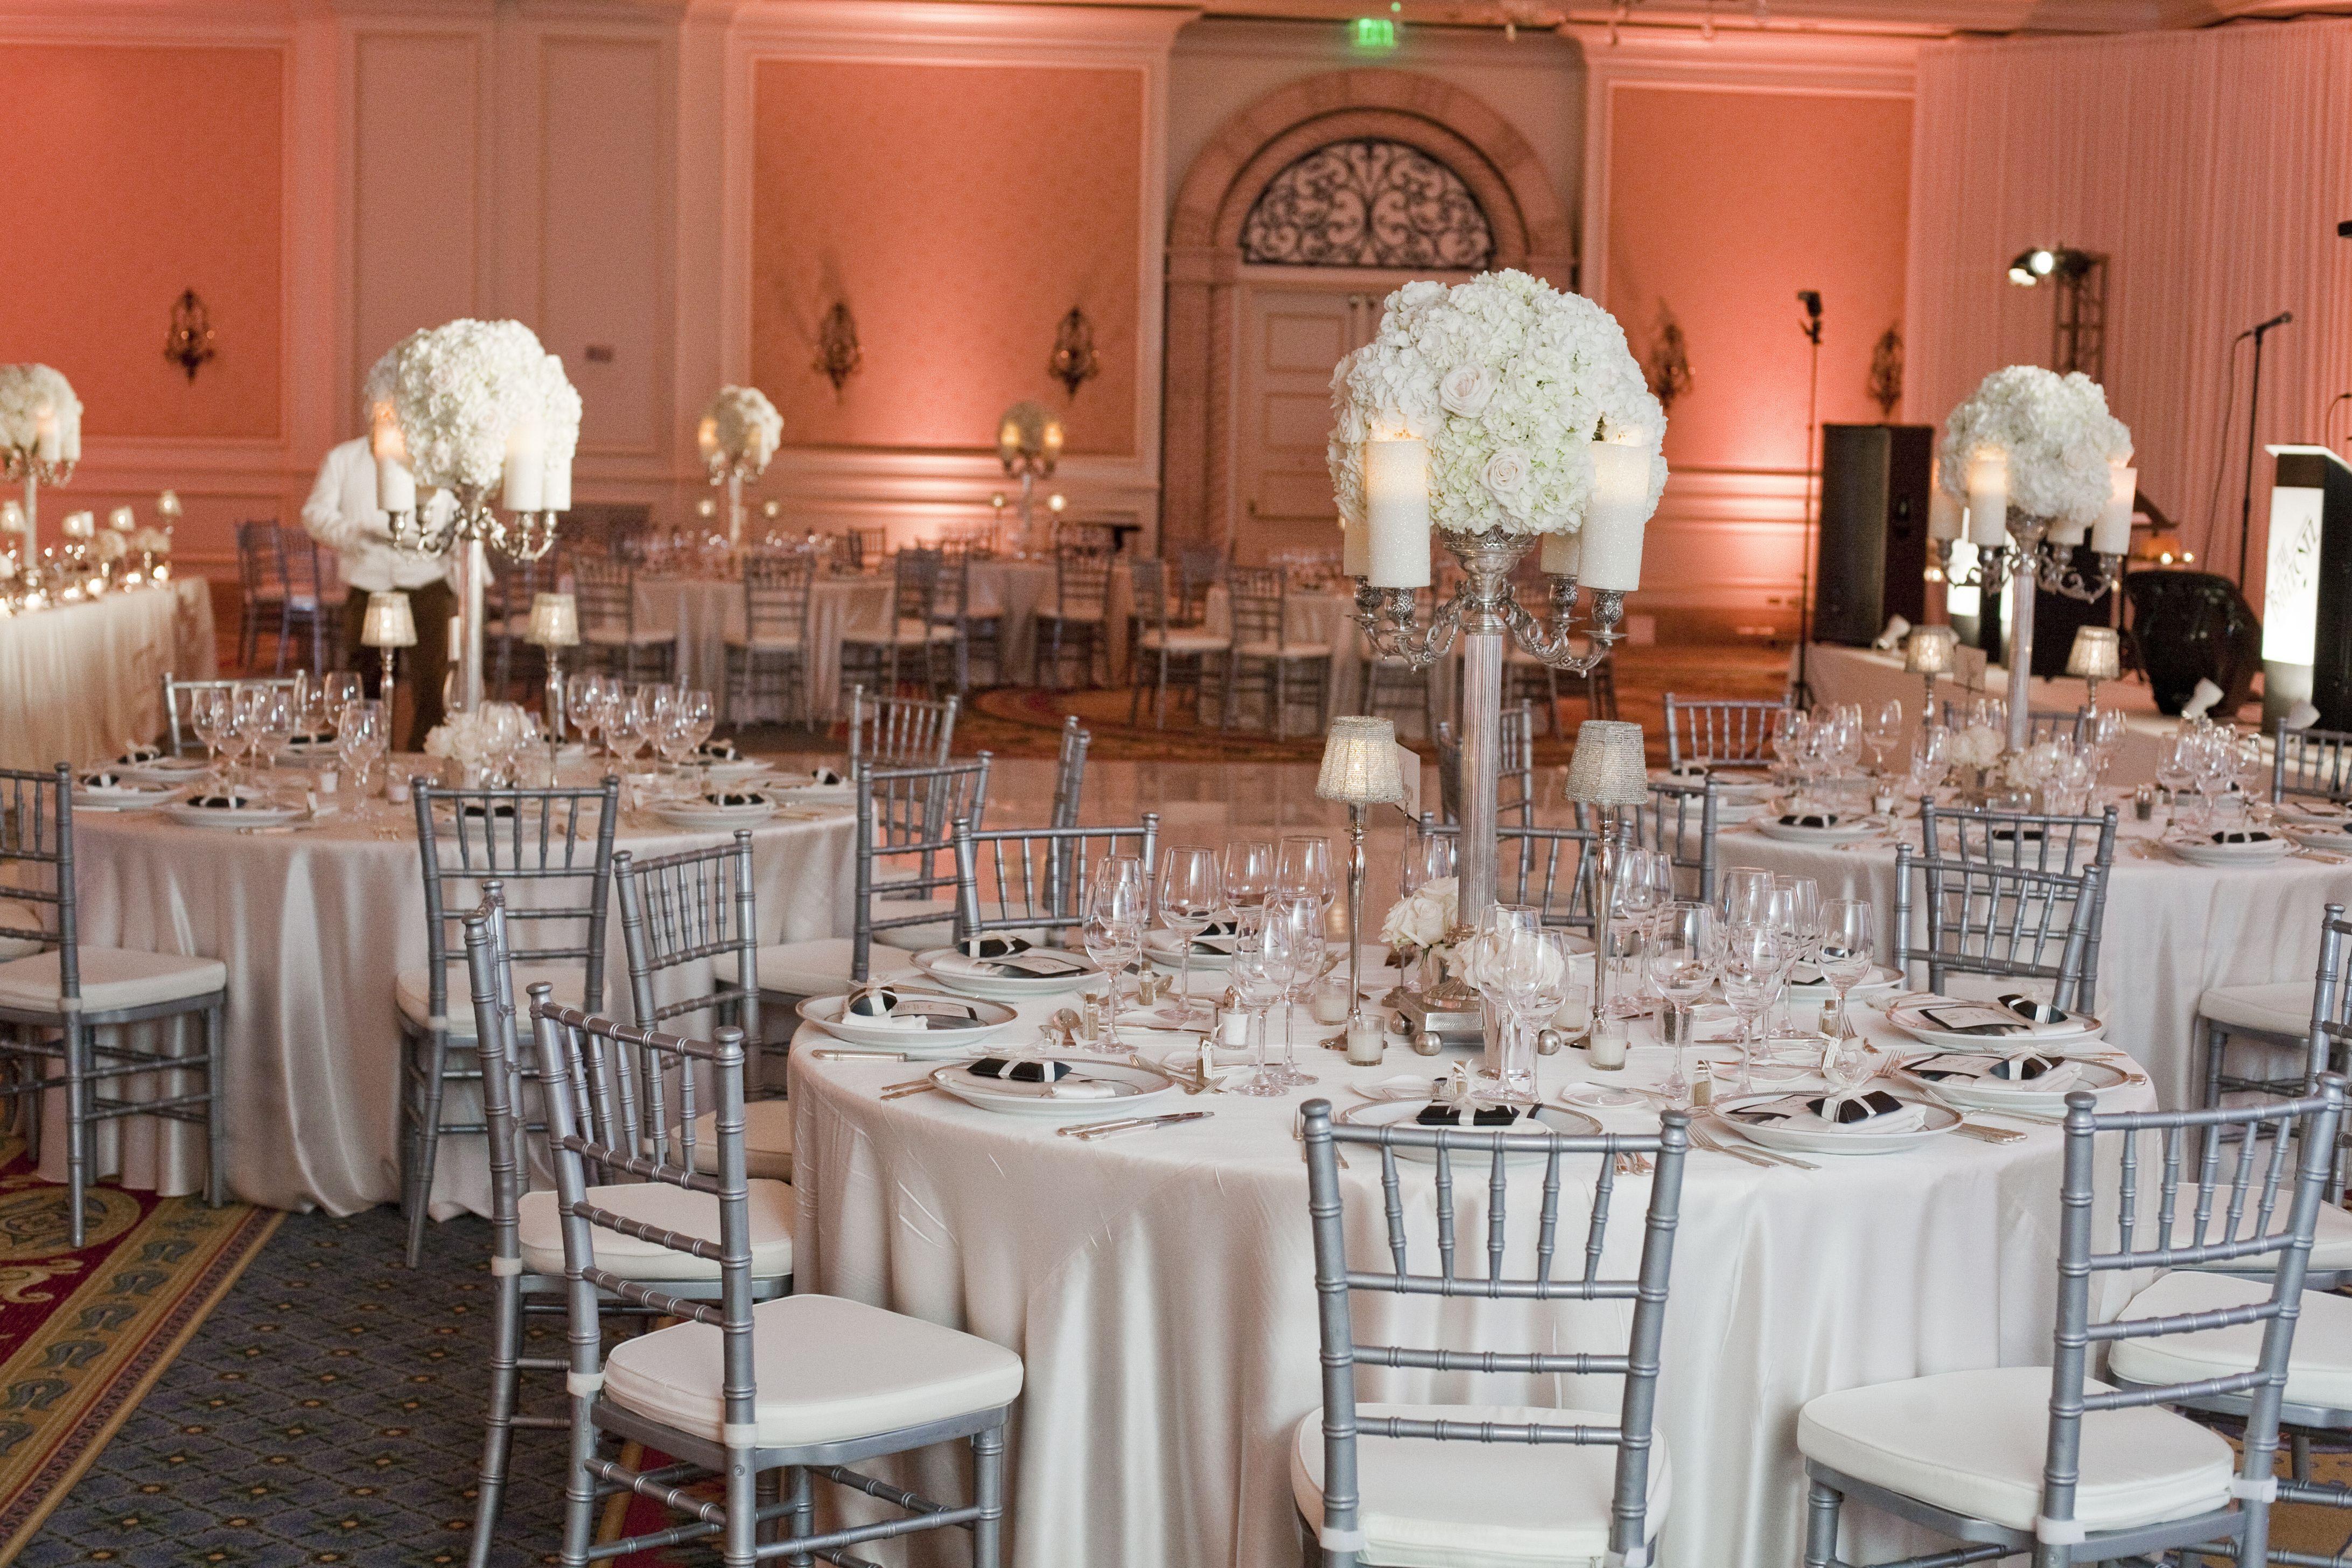 Tiffany Blue Wedding Chair Covers Personalized A Affair Inc Silver Chiavari Chairs At Ritz Carlton